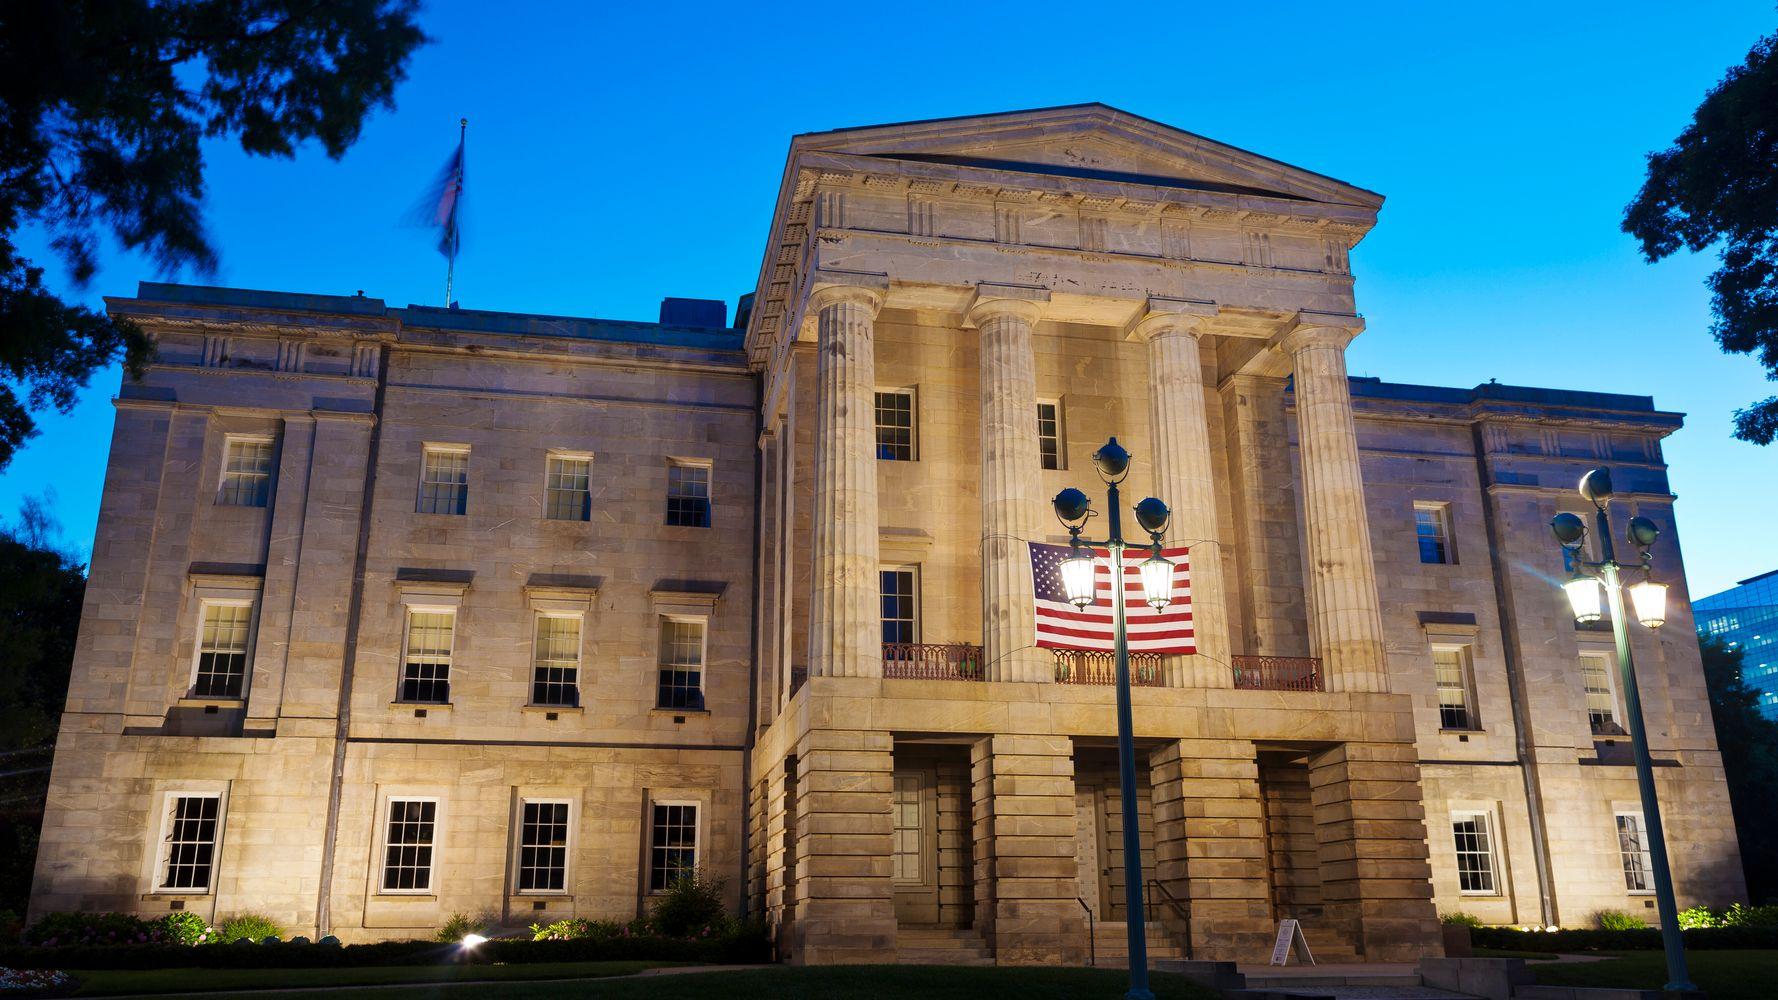 Westlake Legal Group 5db75e622100002838ad42b1 Court Strikes Down North Carolina Congressional Map